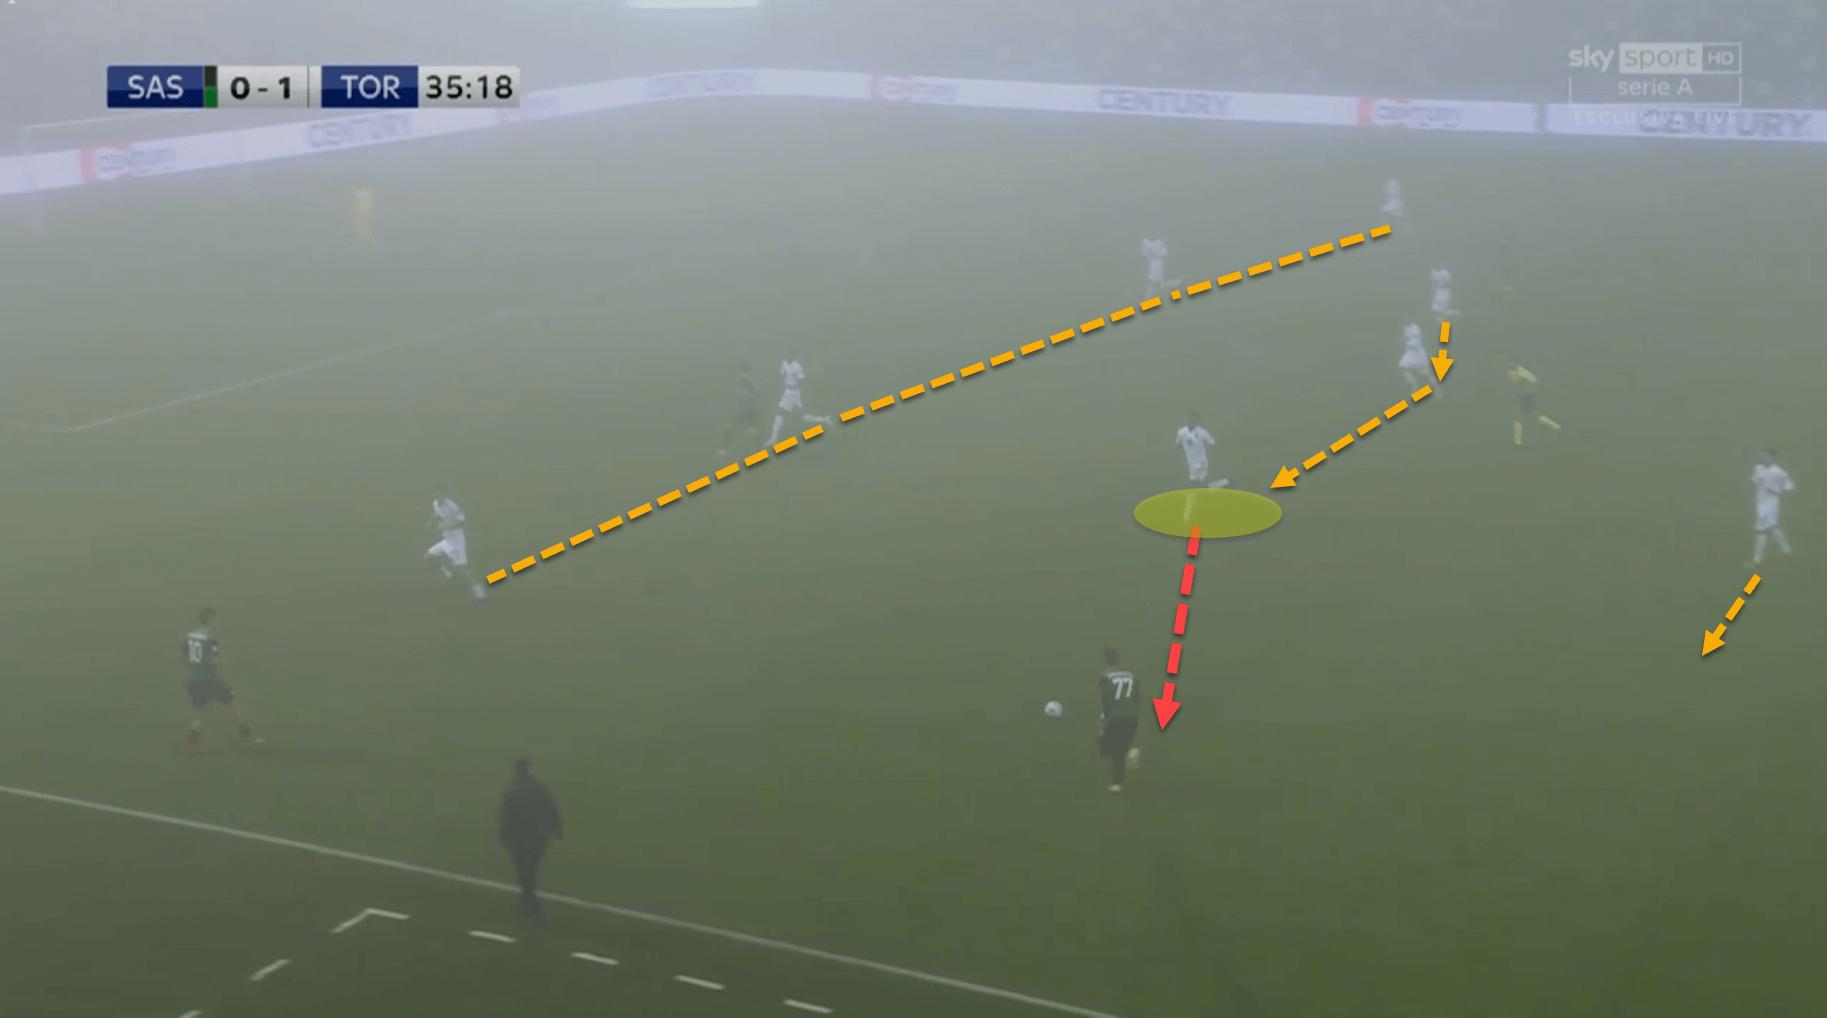 Serie A 2020/21 - Sassuolo vs Torino - tactical analysis tactics